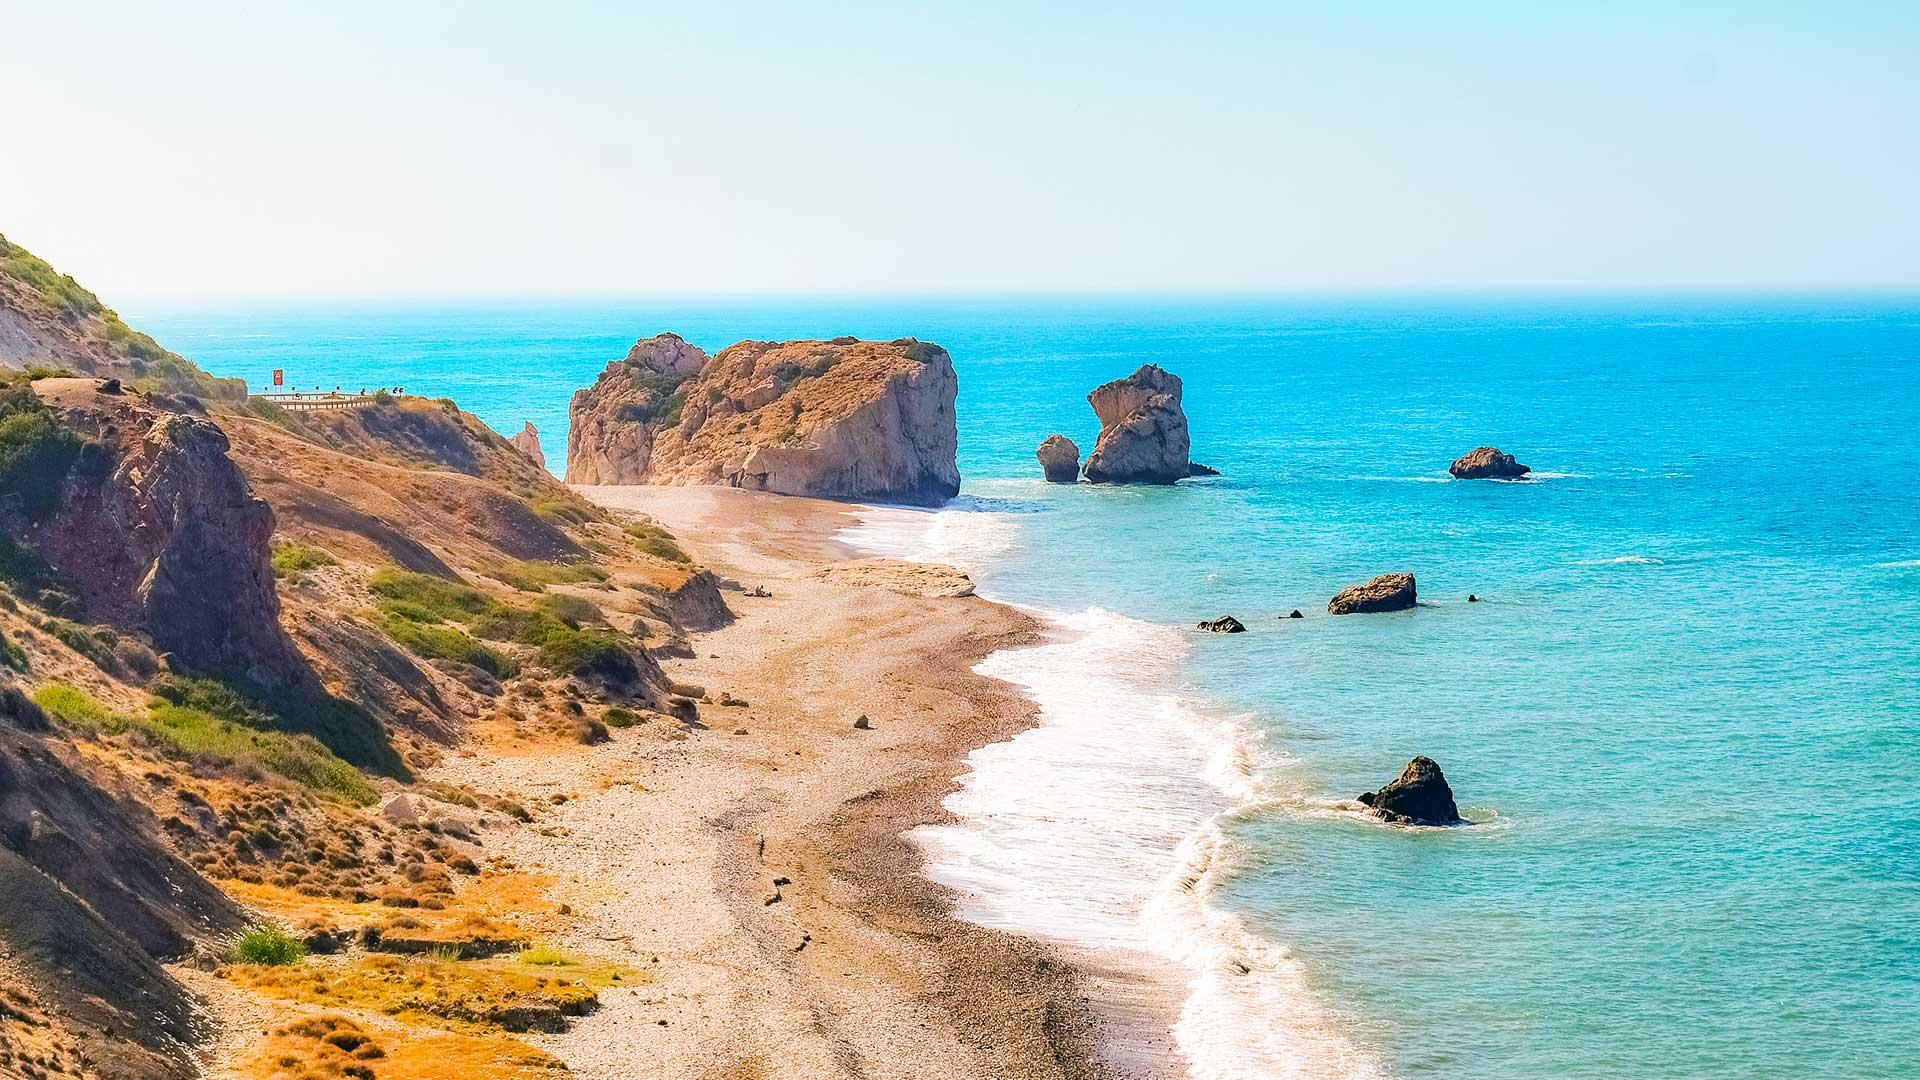 Cyprus Itinerary Aromatic, Healing Herbs & Mythology